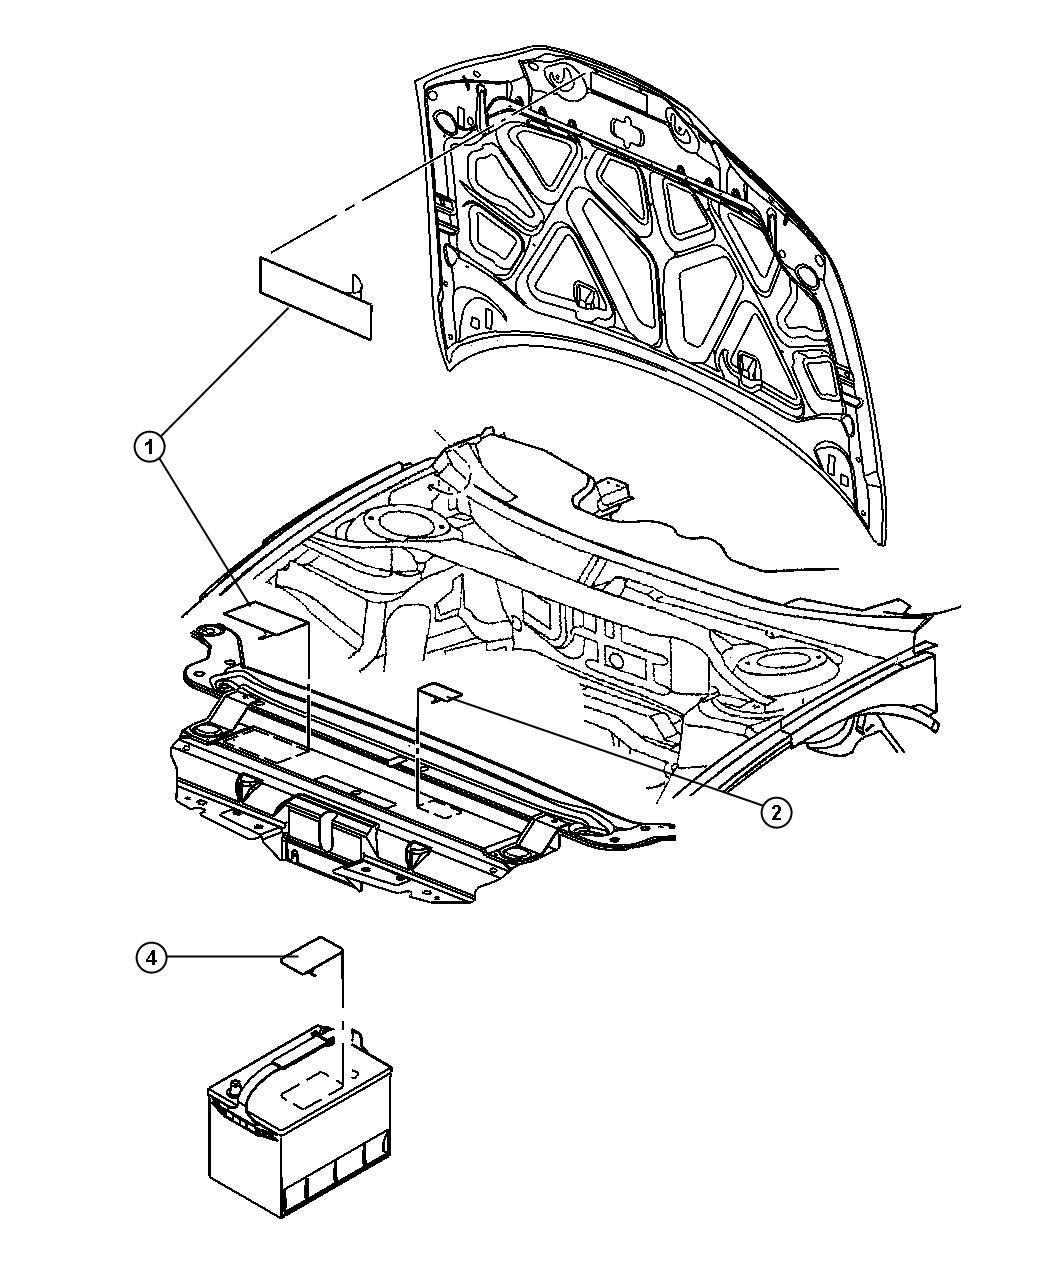 Dodge Intrepid Label Battery Battery Warning Export